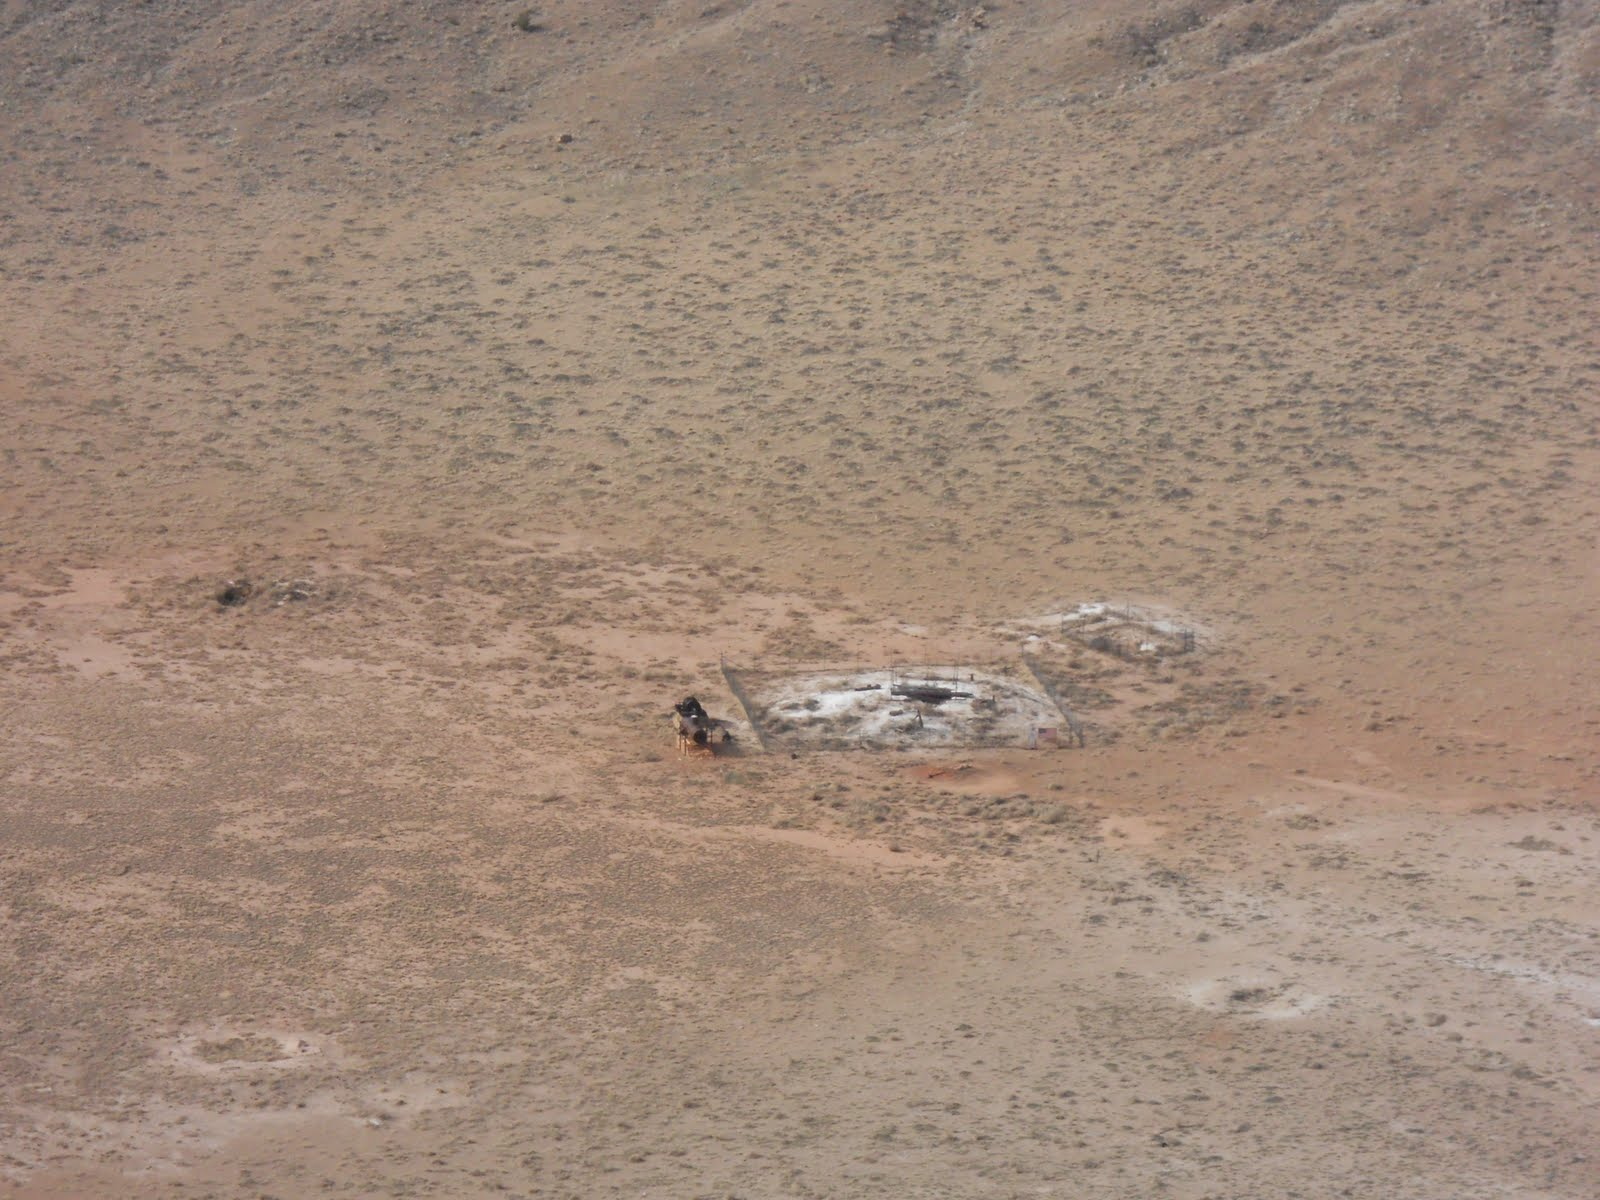 asteroid new mexico - photo #35